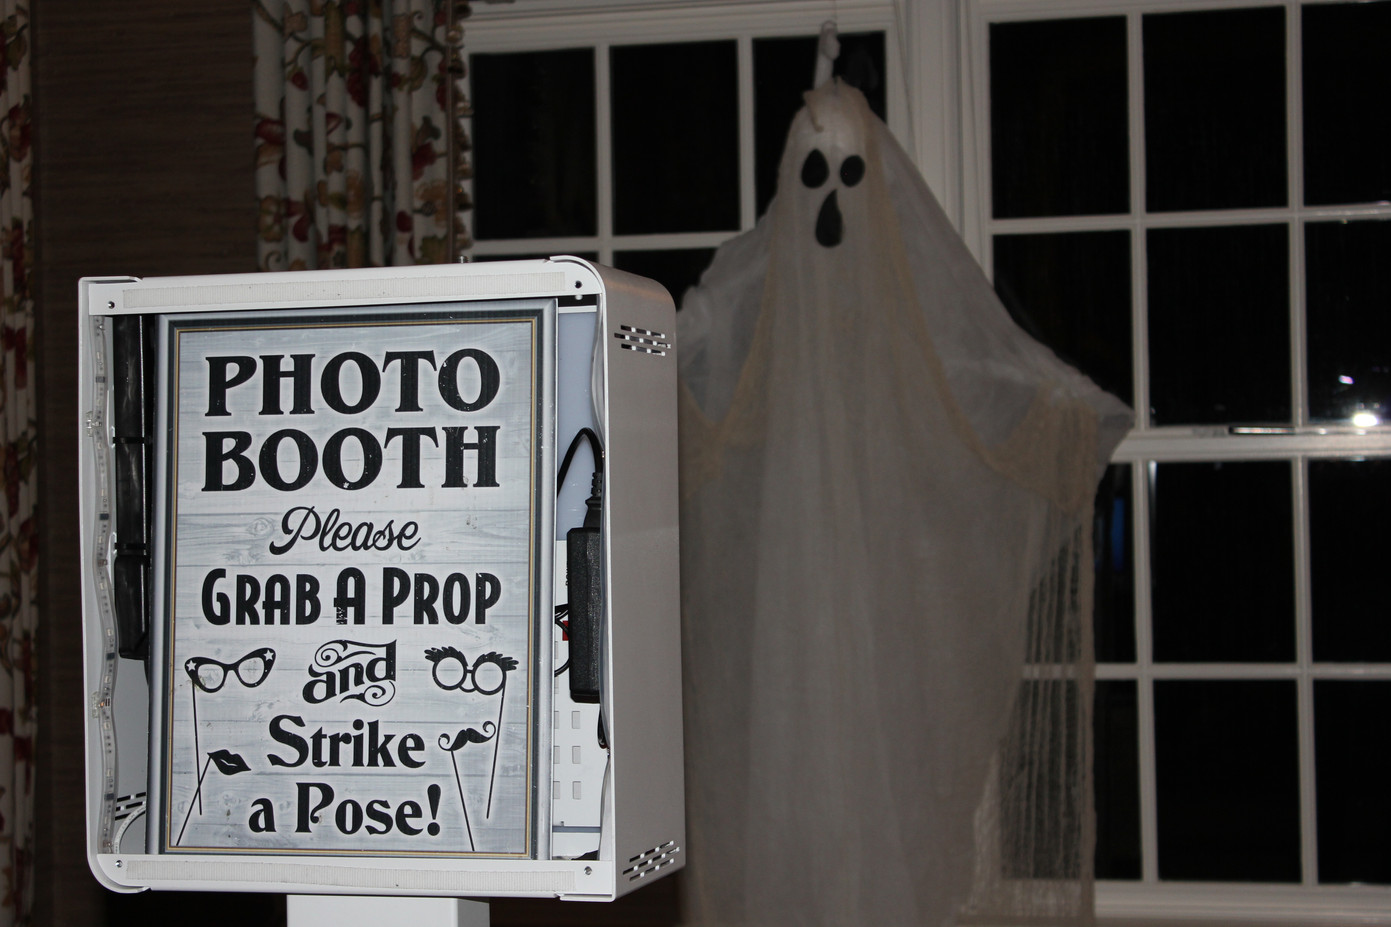 Photo-Booth-Halloween-Themed.JPG